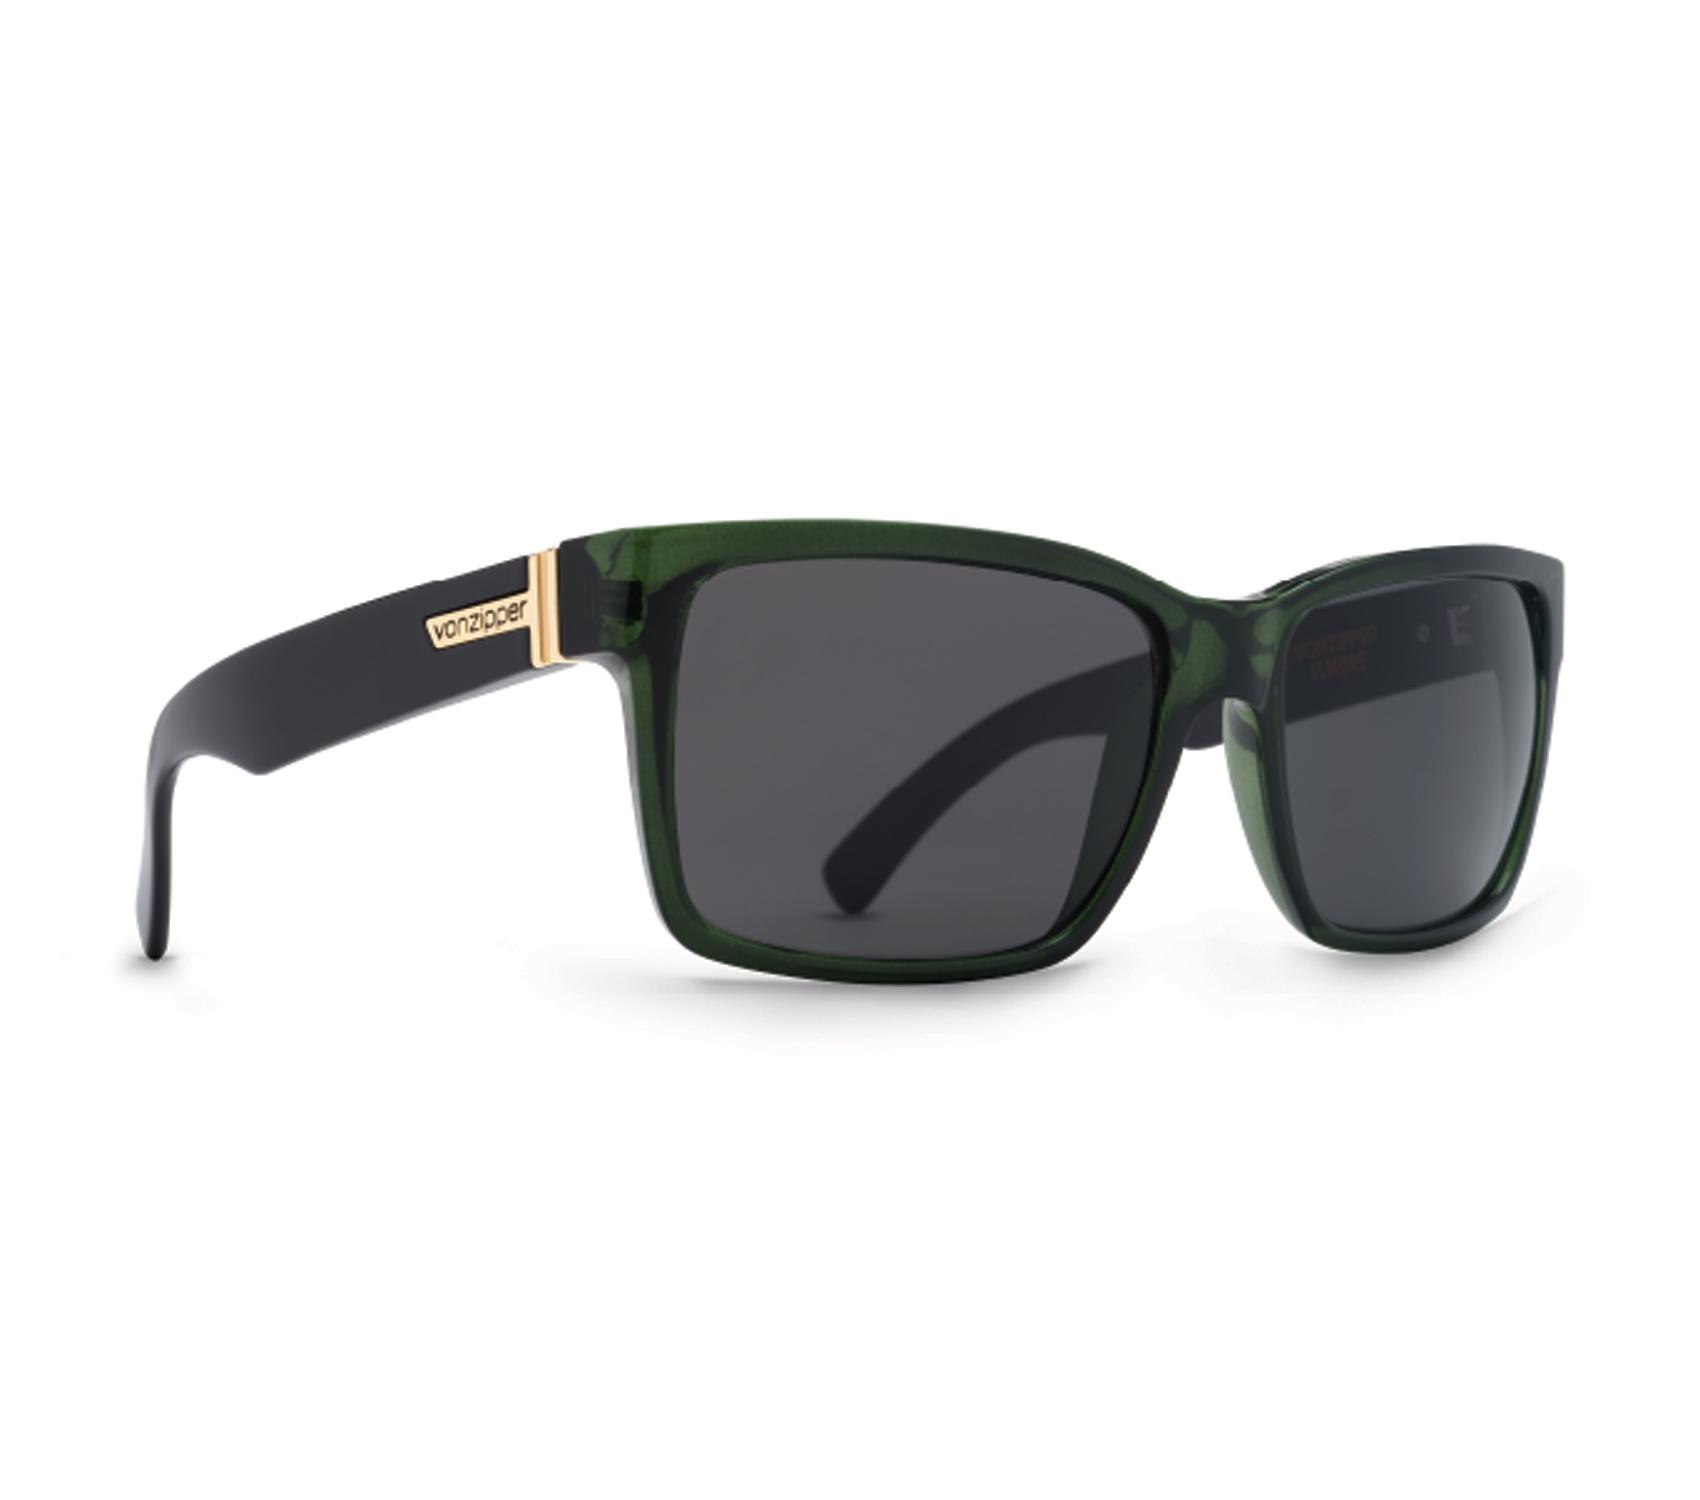 Product image of VonZipper Elmore Sunglasses-Bottle Green Black Crystal - New Grey Lens